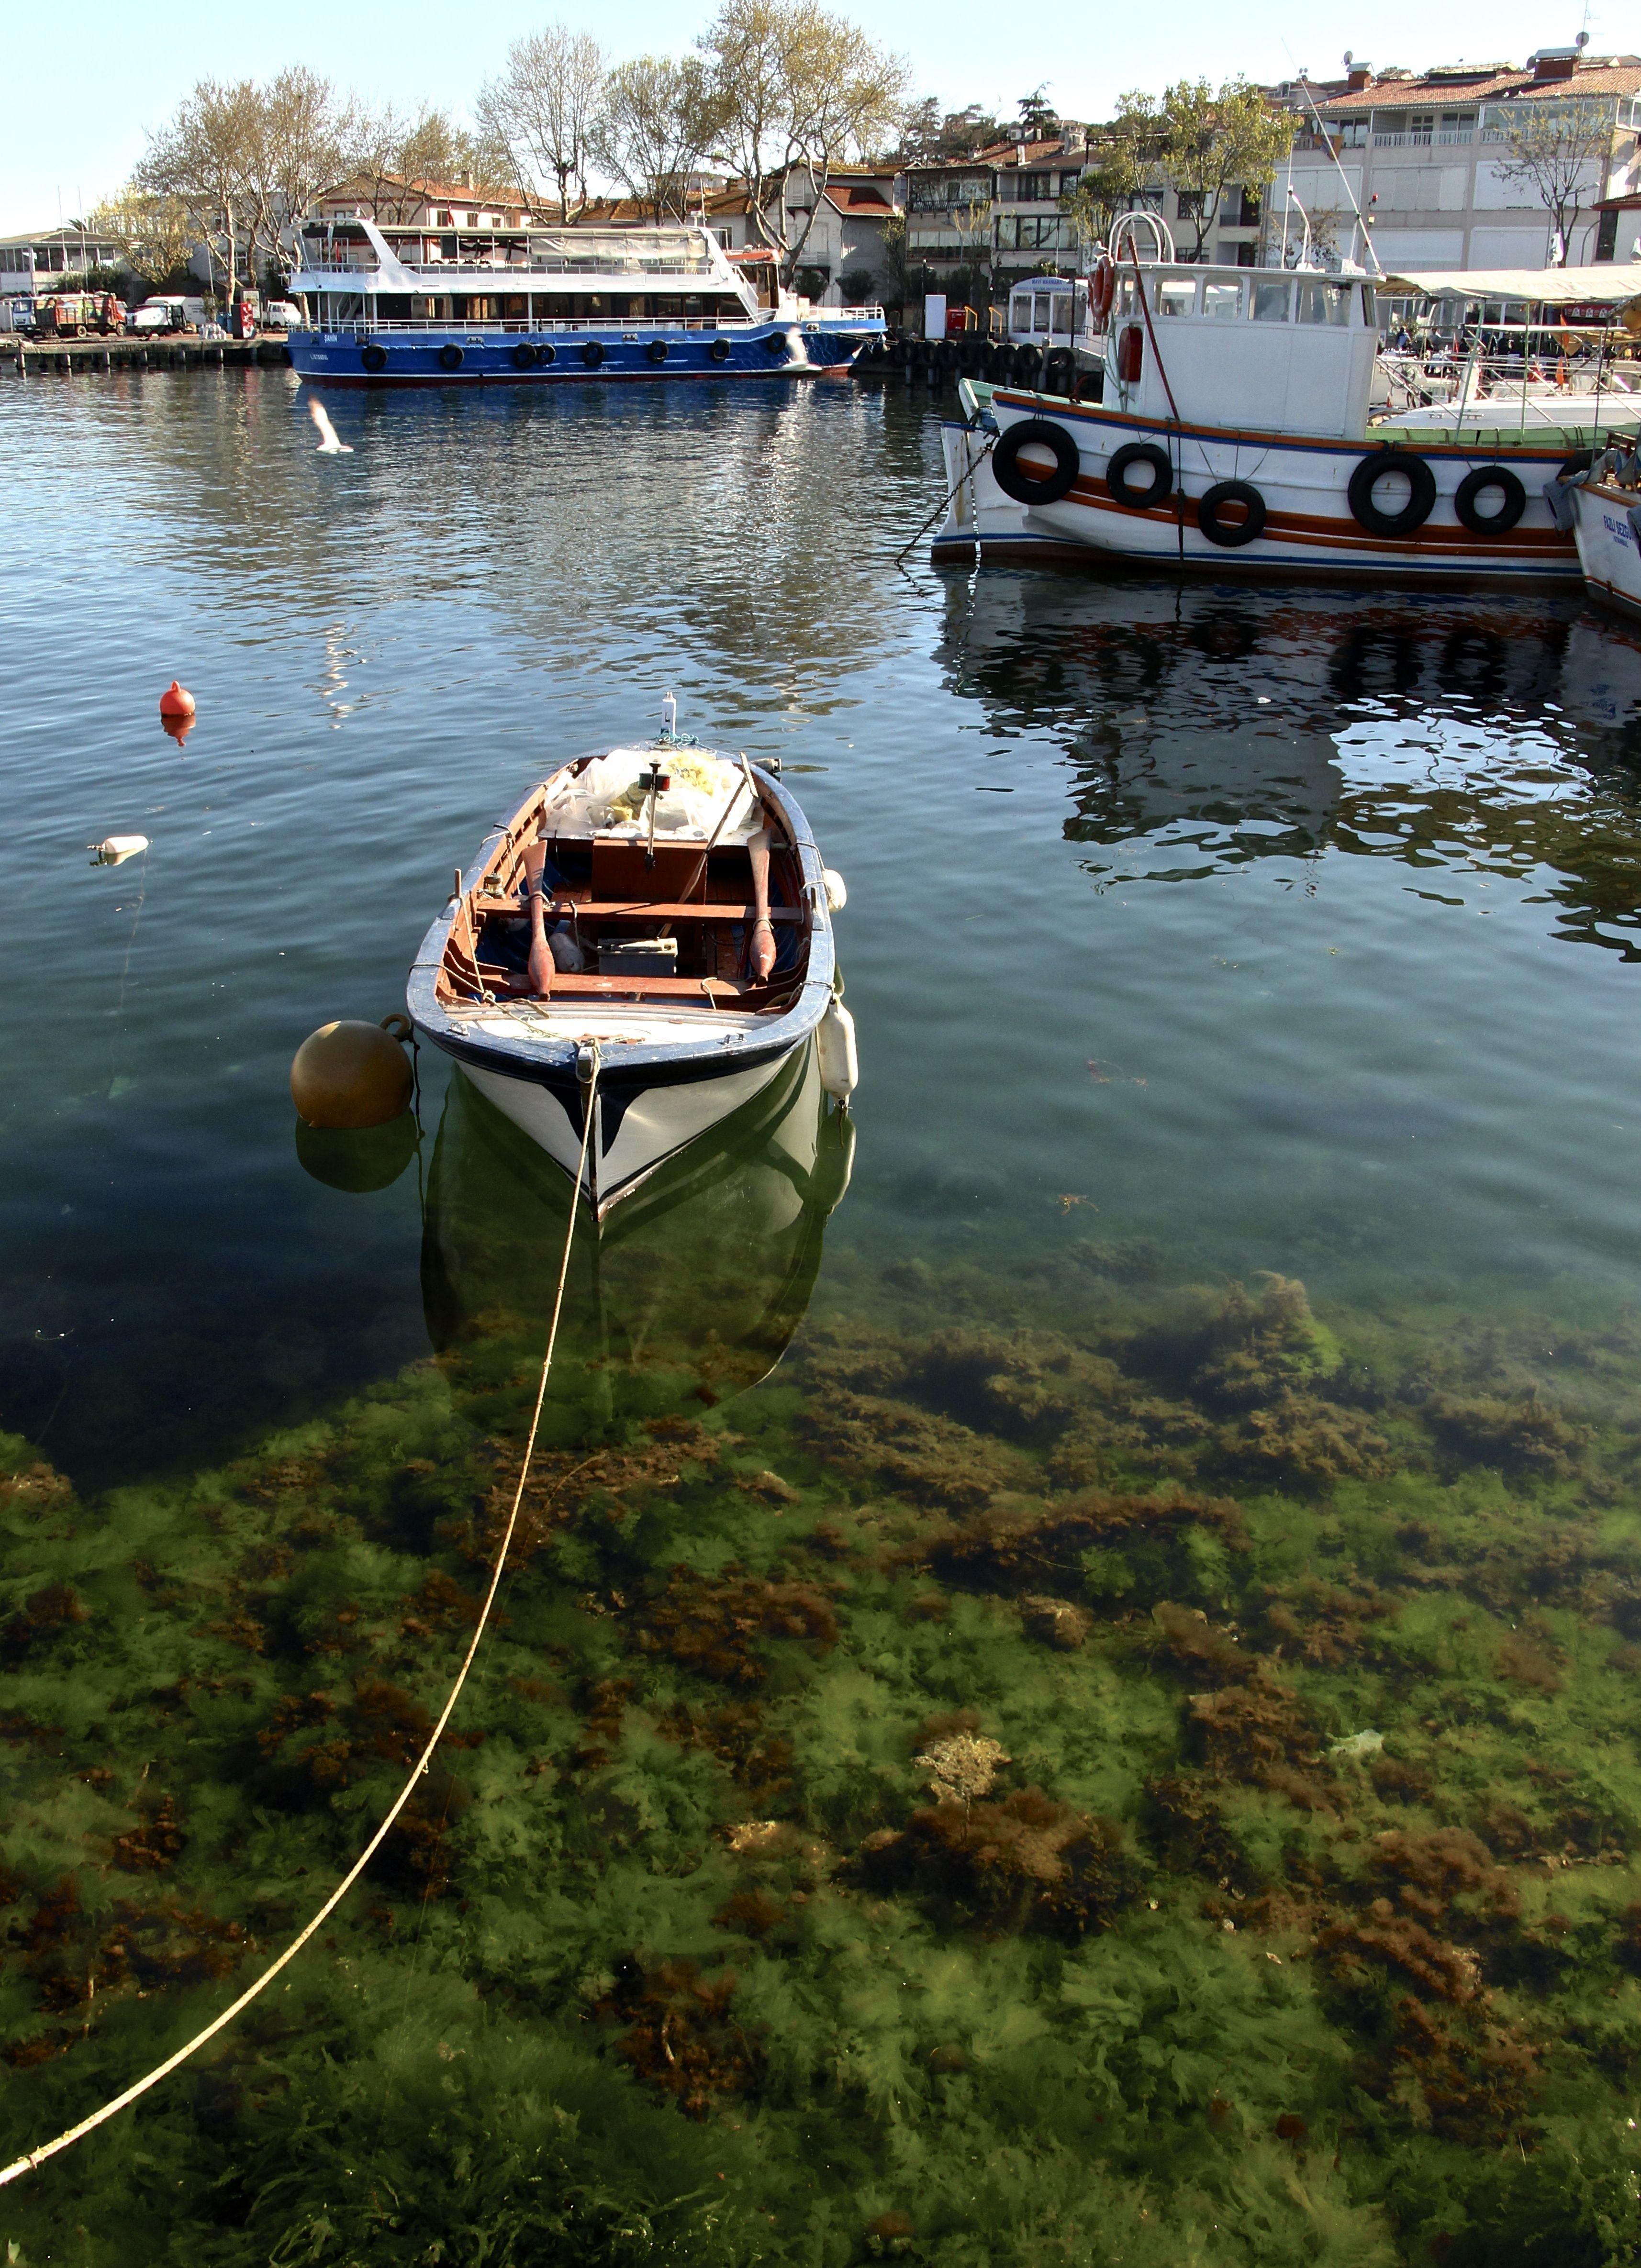 Burgazada, Princess Islands ISTANBUL